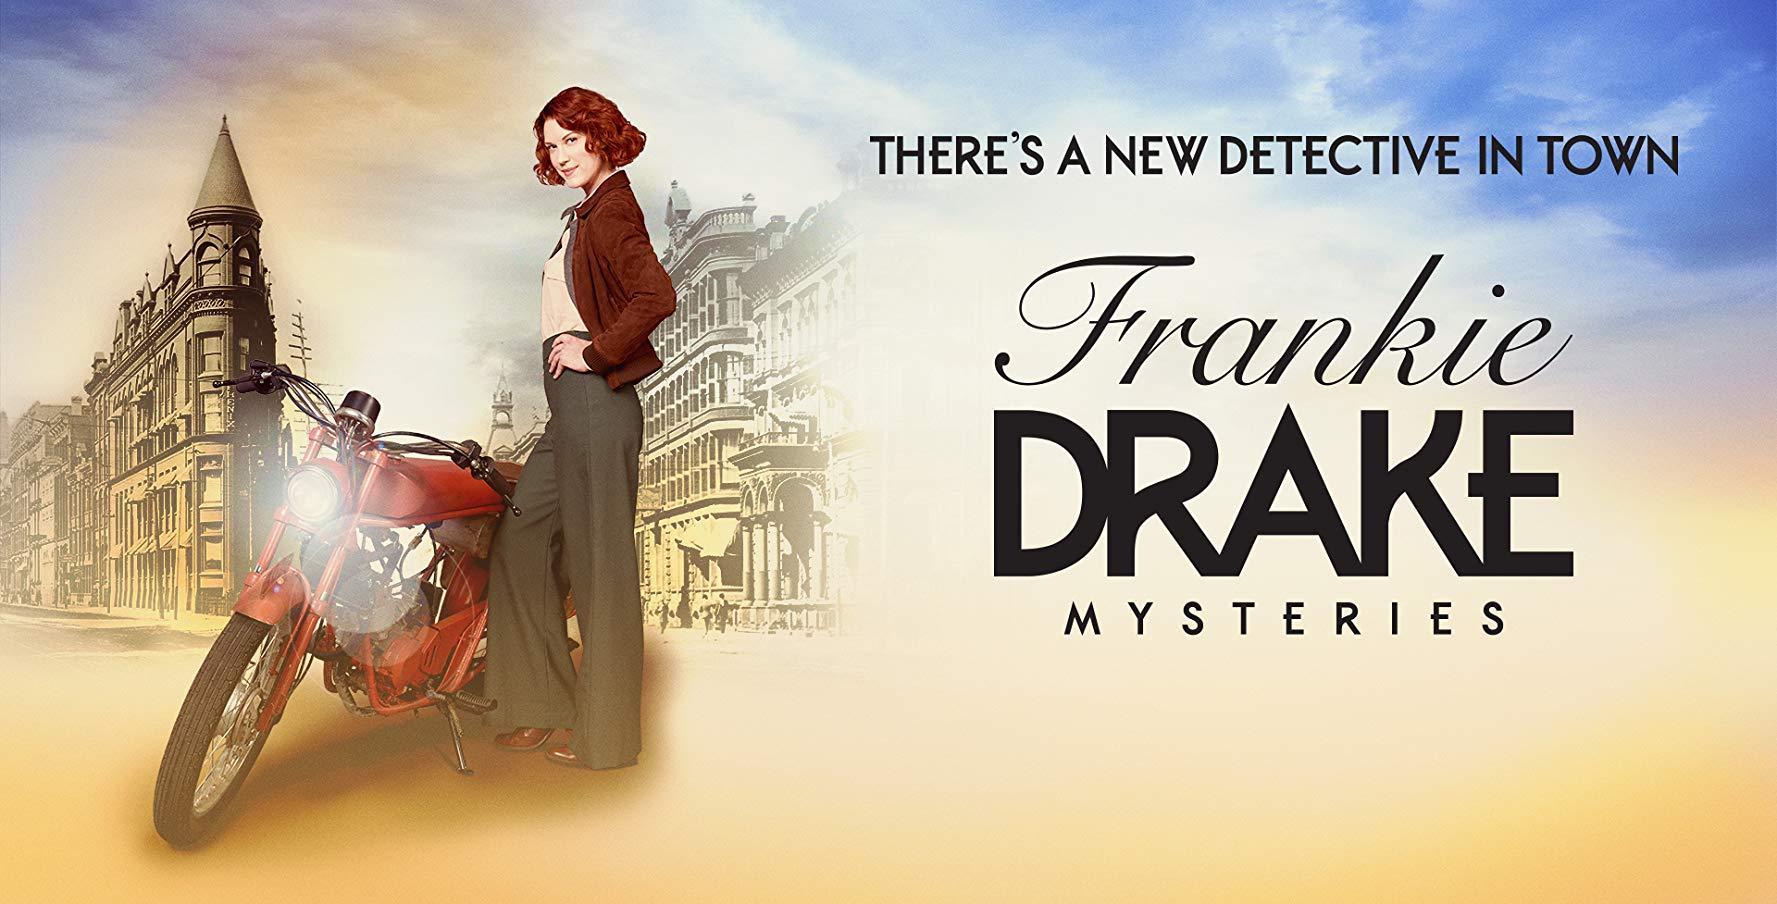 Frankie Drake Mysteries S02E03 720p WEBRip x264-TBS